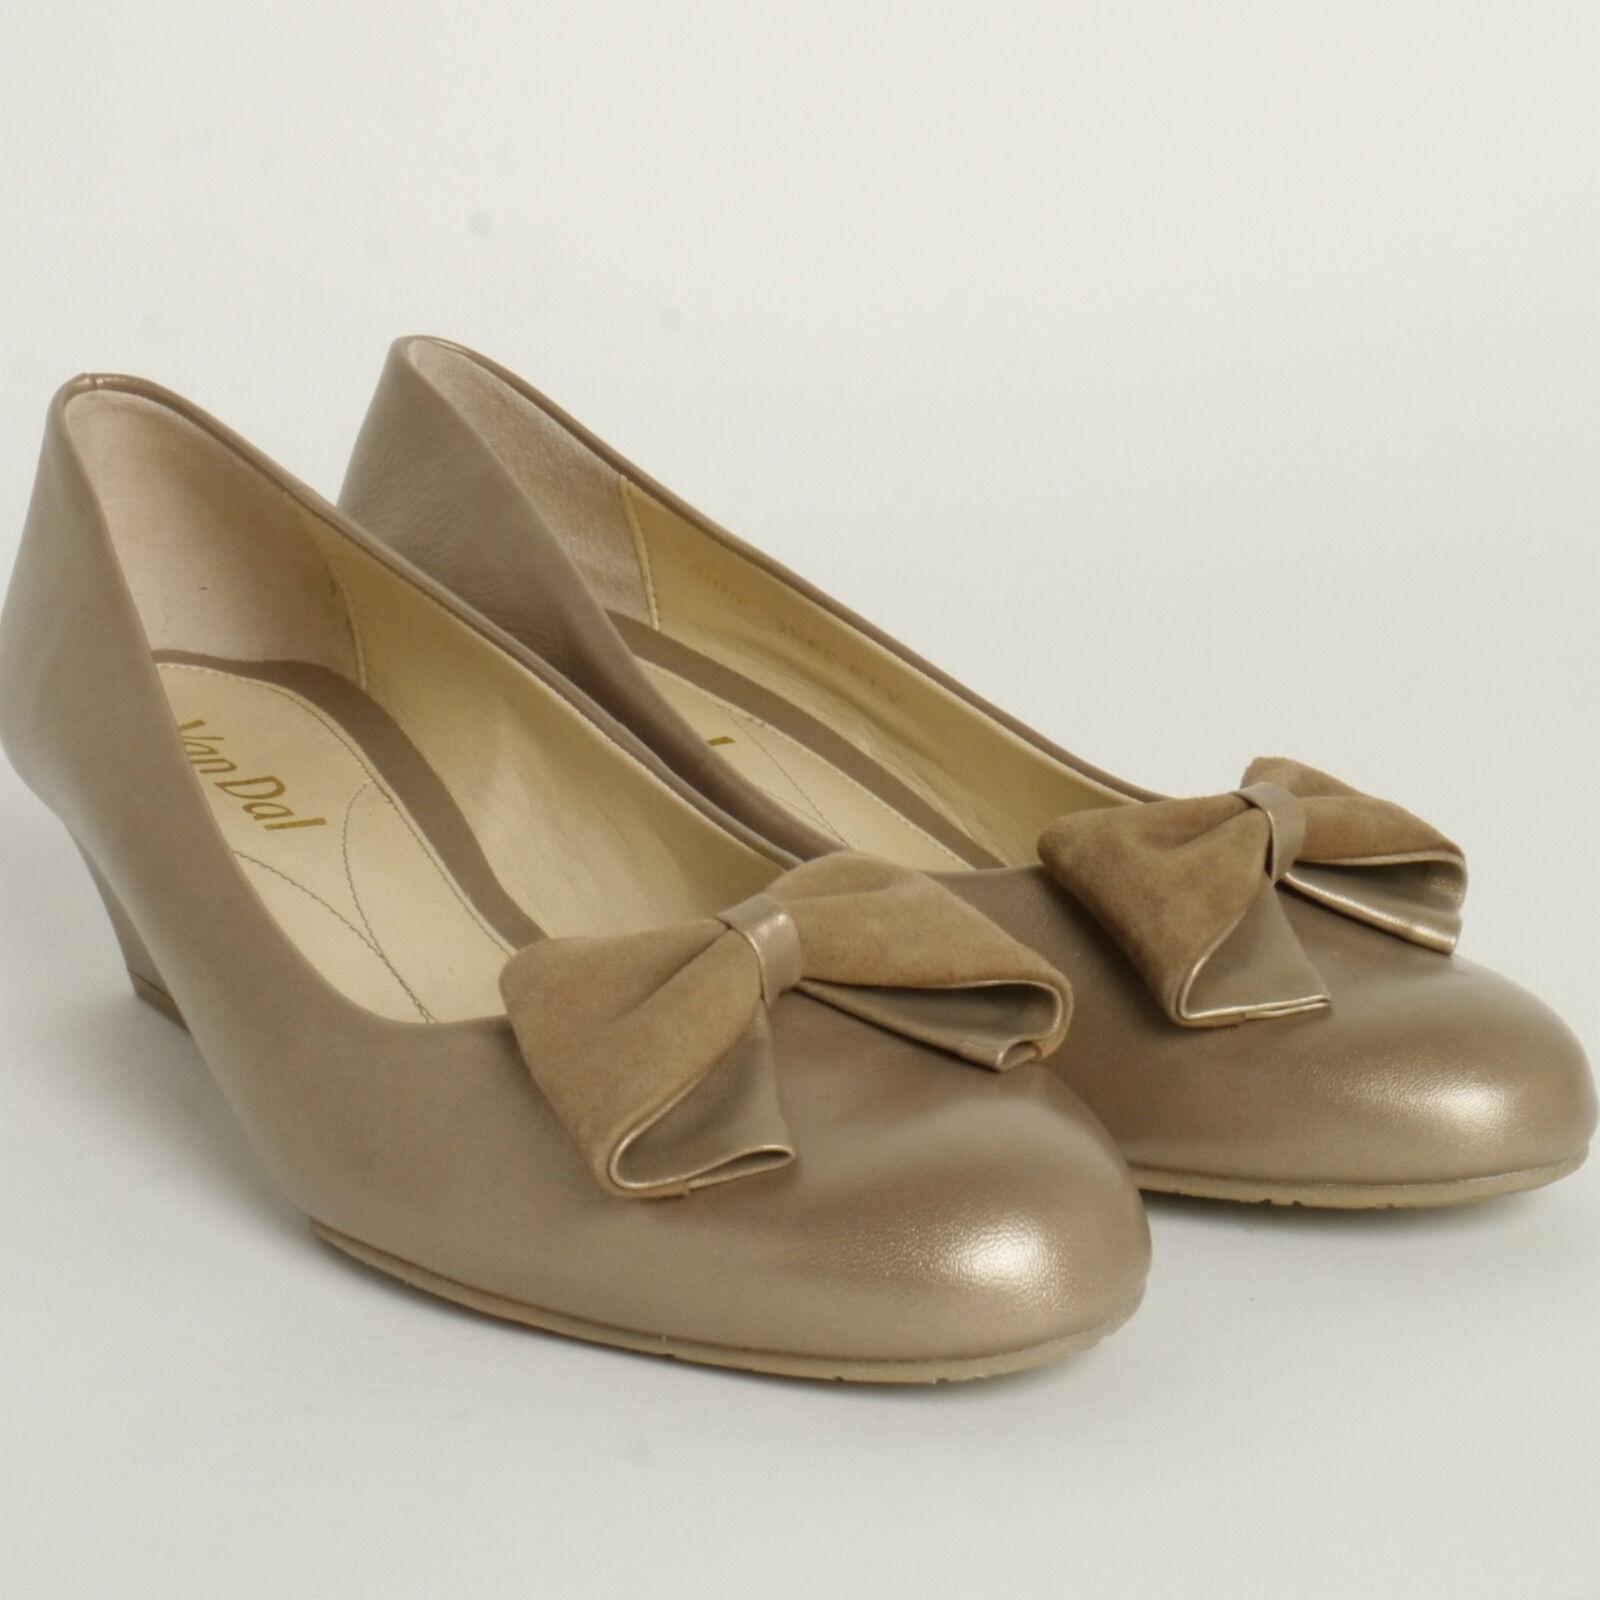 LADIES VAN DAL TAUPE   SUEDE LEATHER scarpe  RIOM  E EE FITTING   Buy Speciale    Sig/Sig Ra Scarpa